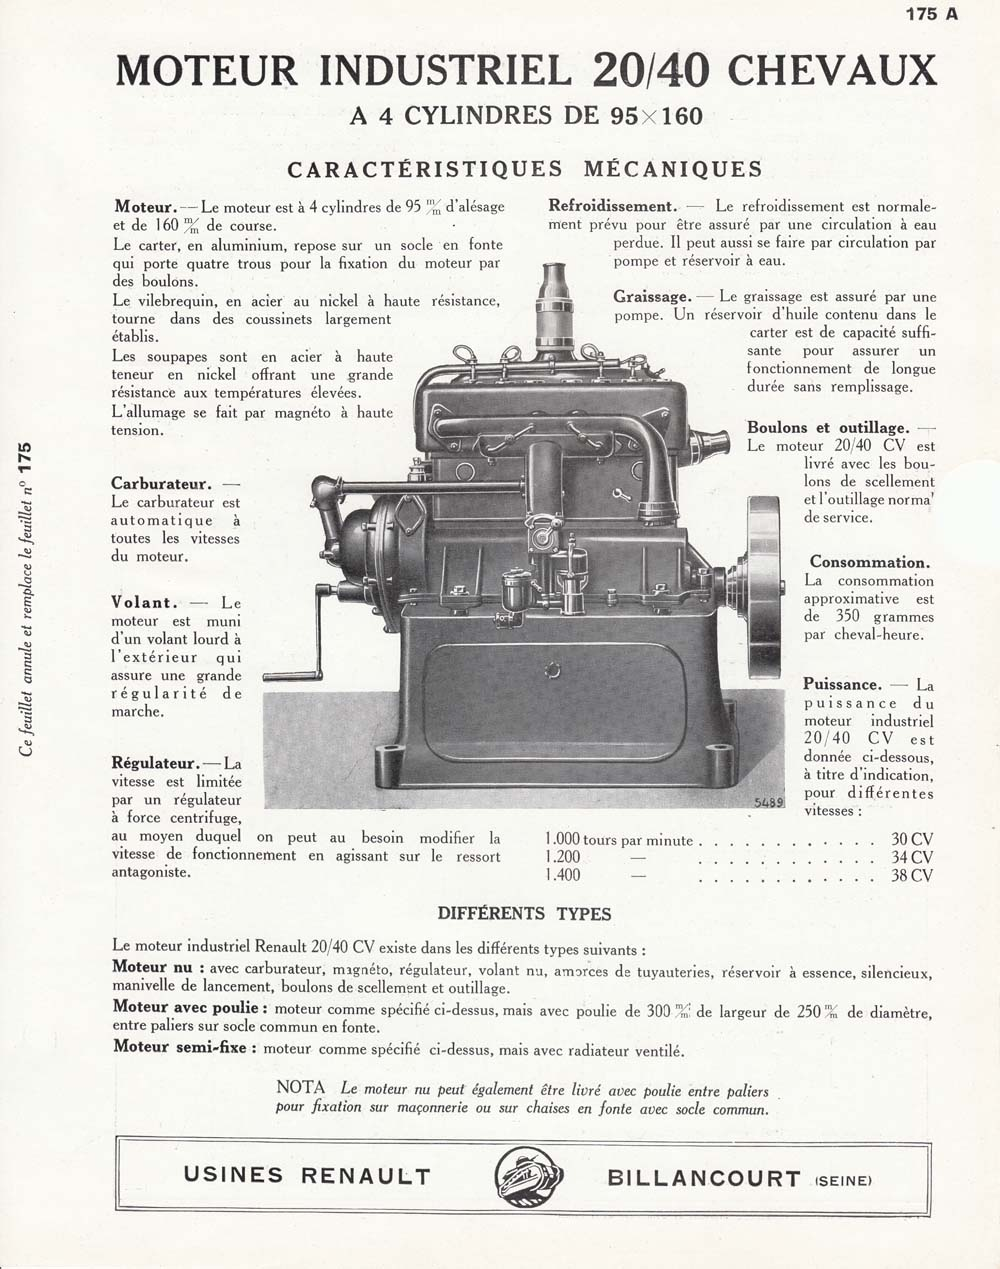 moteur_industriel_20_40cv_4cyl_1